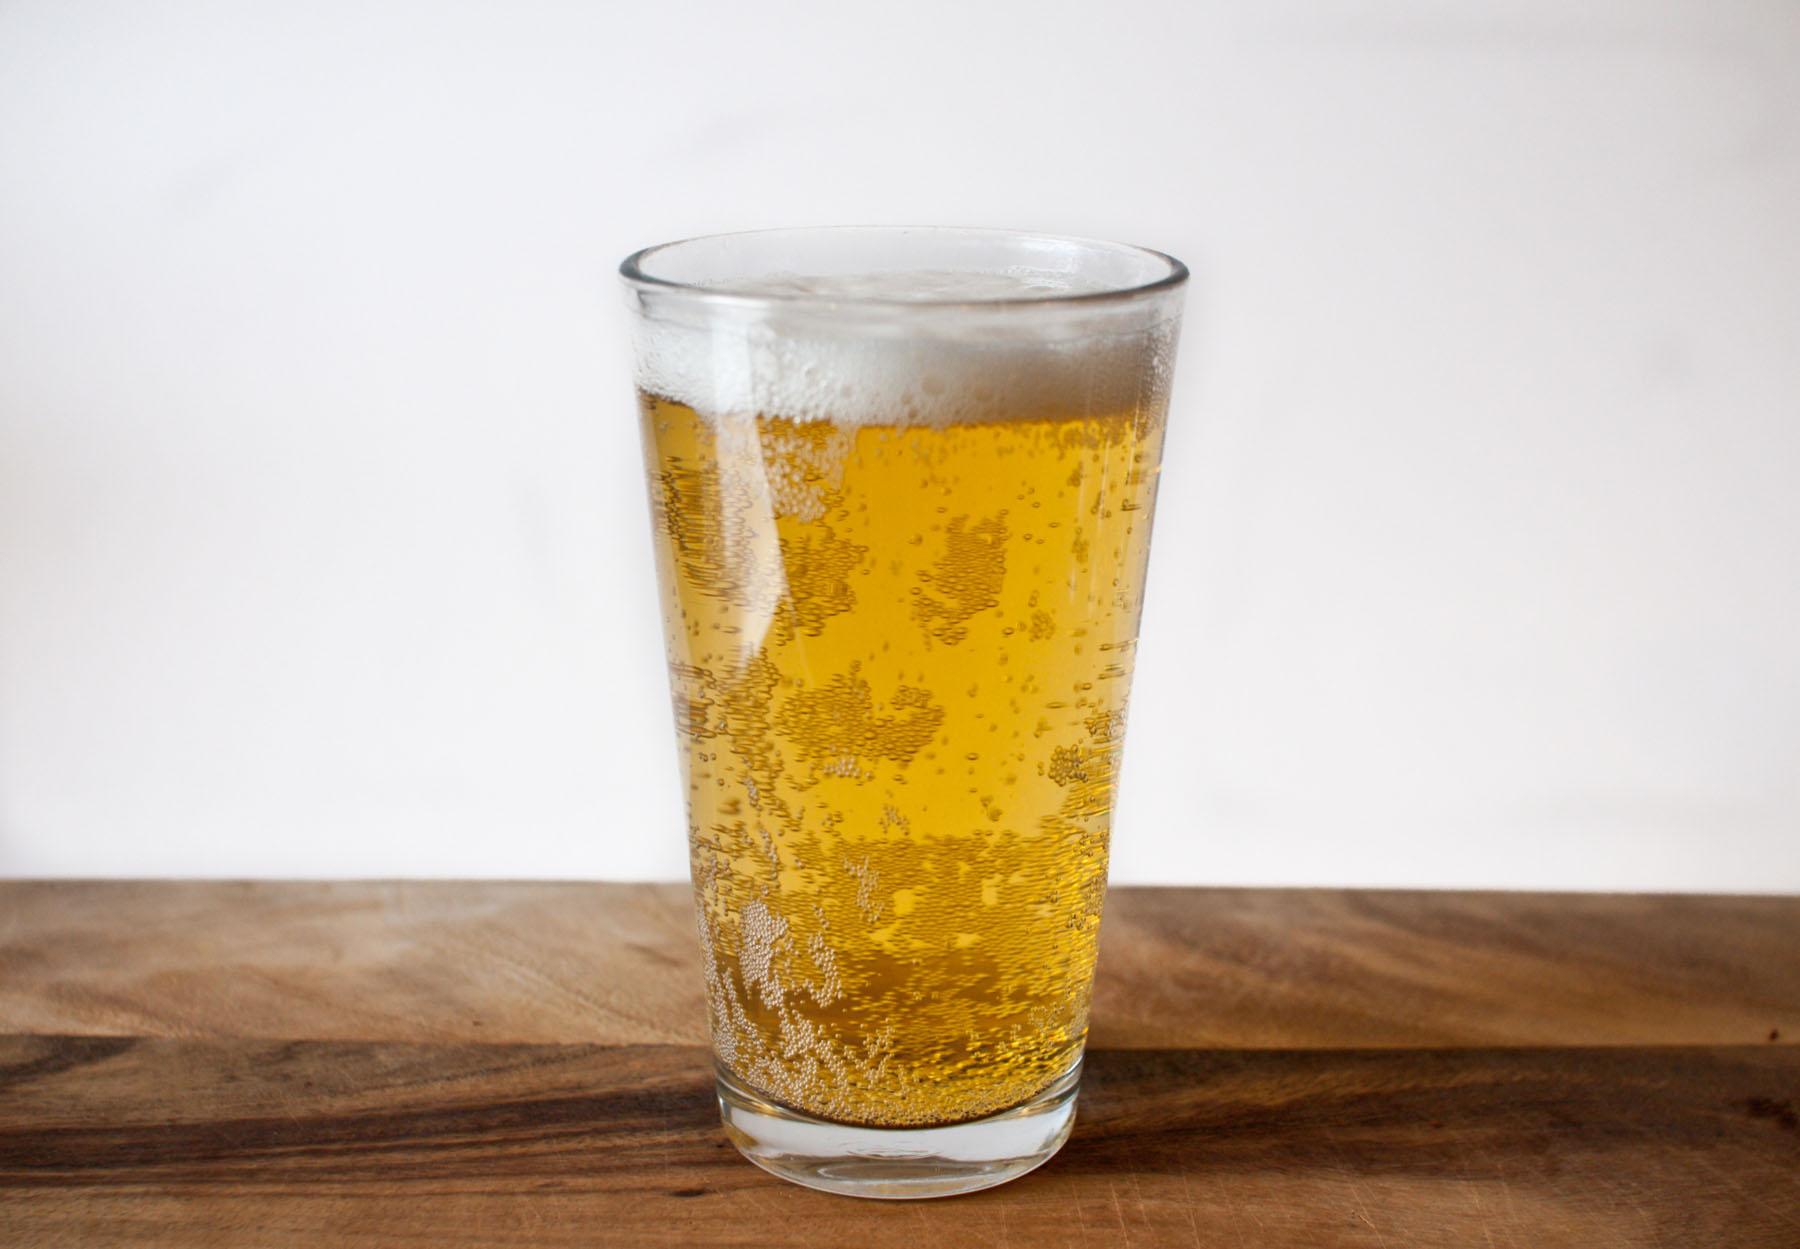 H πολλή μπύρα αυξάνει τον κίνδυνο καρκίνου στο στομάχι thumbnail